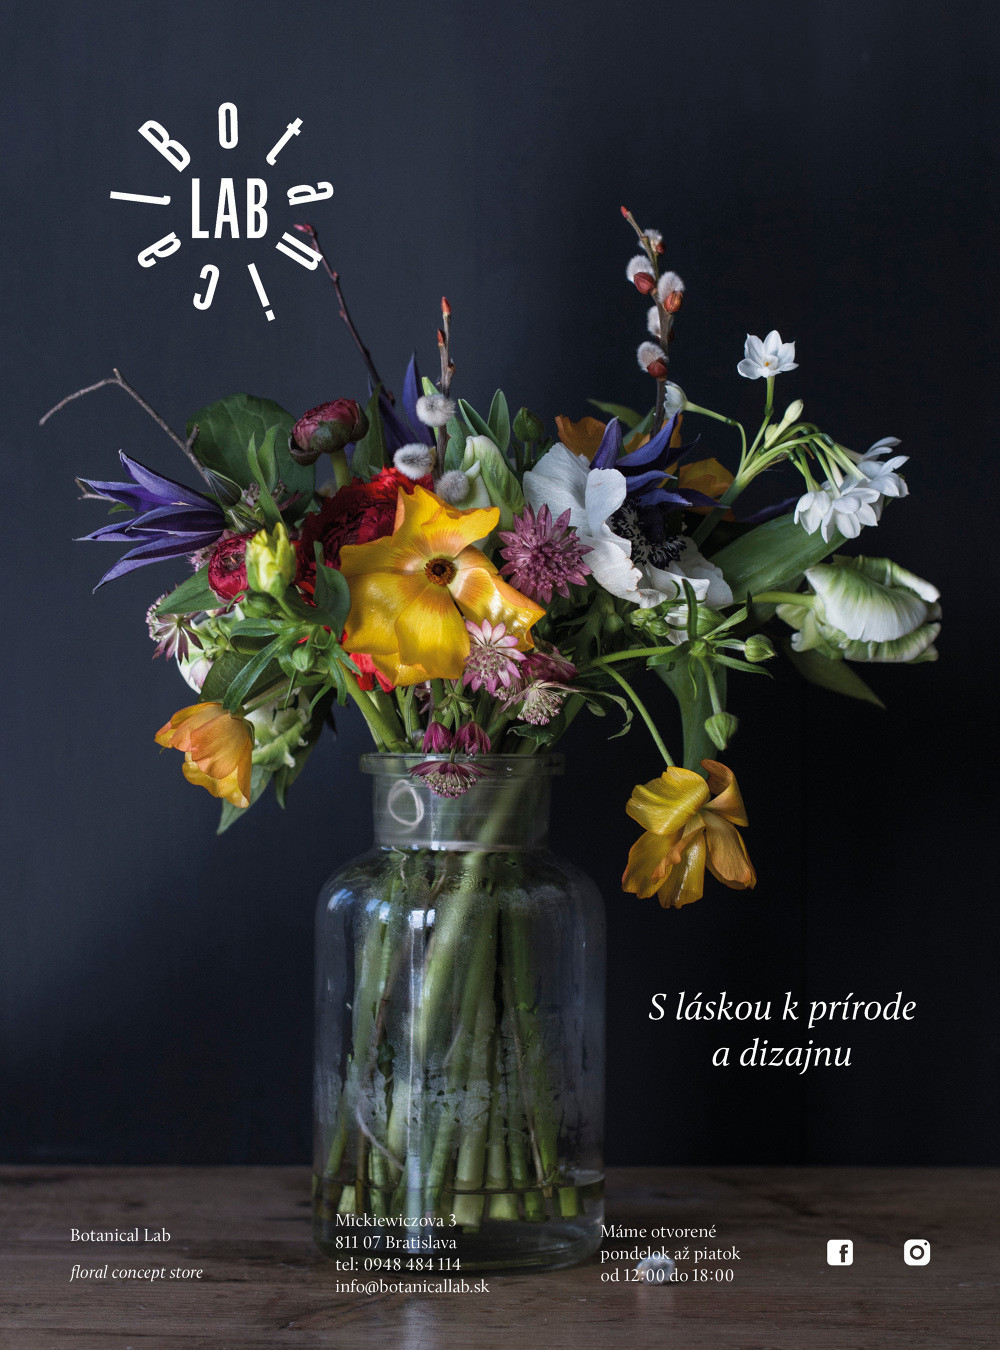 "long flower vase online of 10 awesome small flower vase online bogekompresorturkiye com with 2017 botanical lab ivana palea"" kova from small flower vase online"